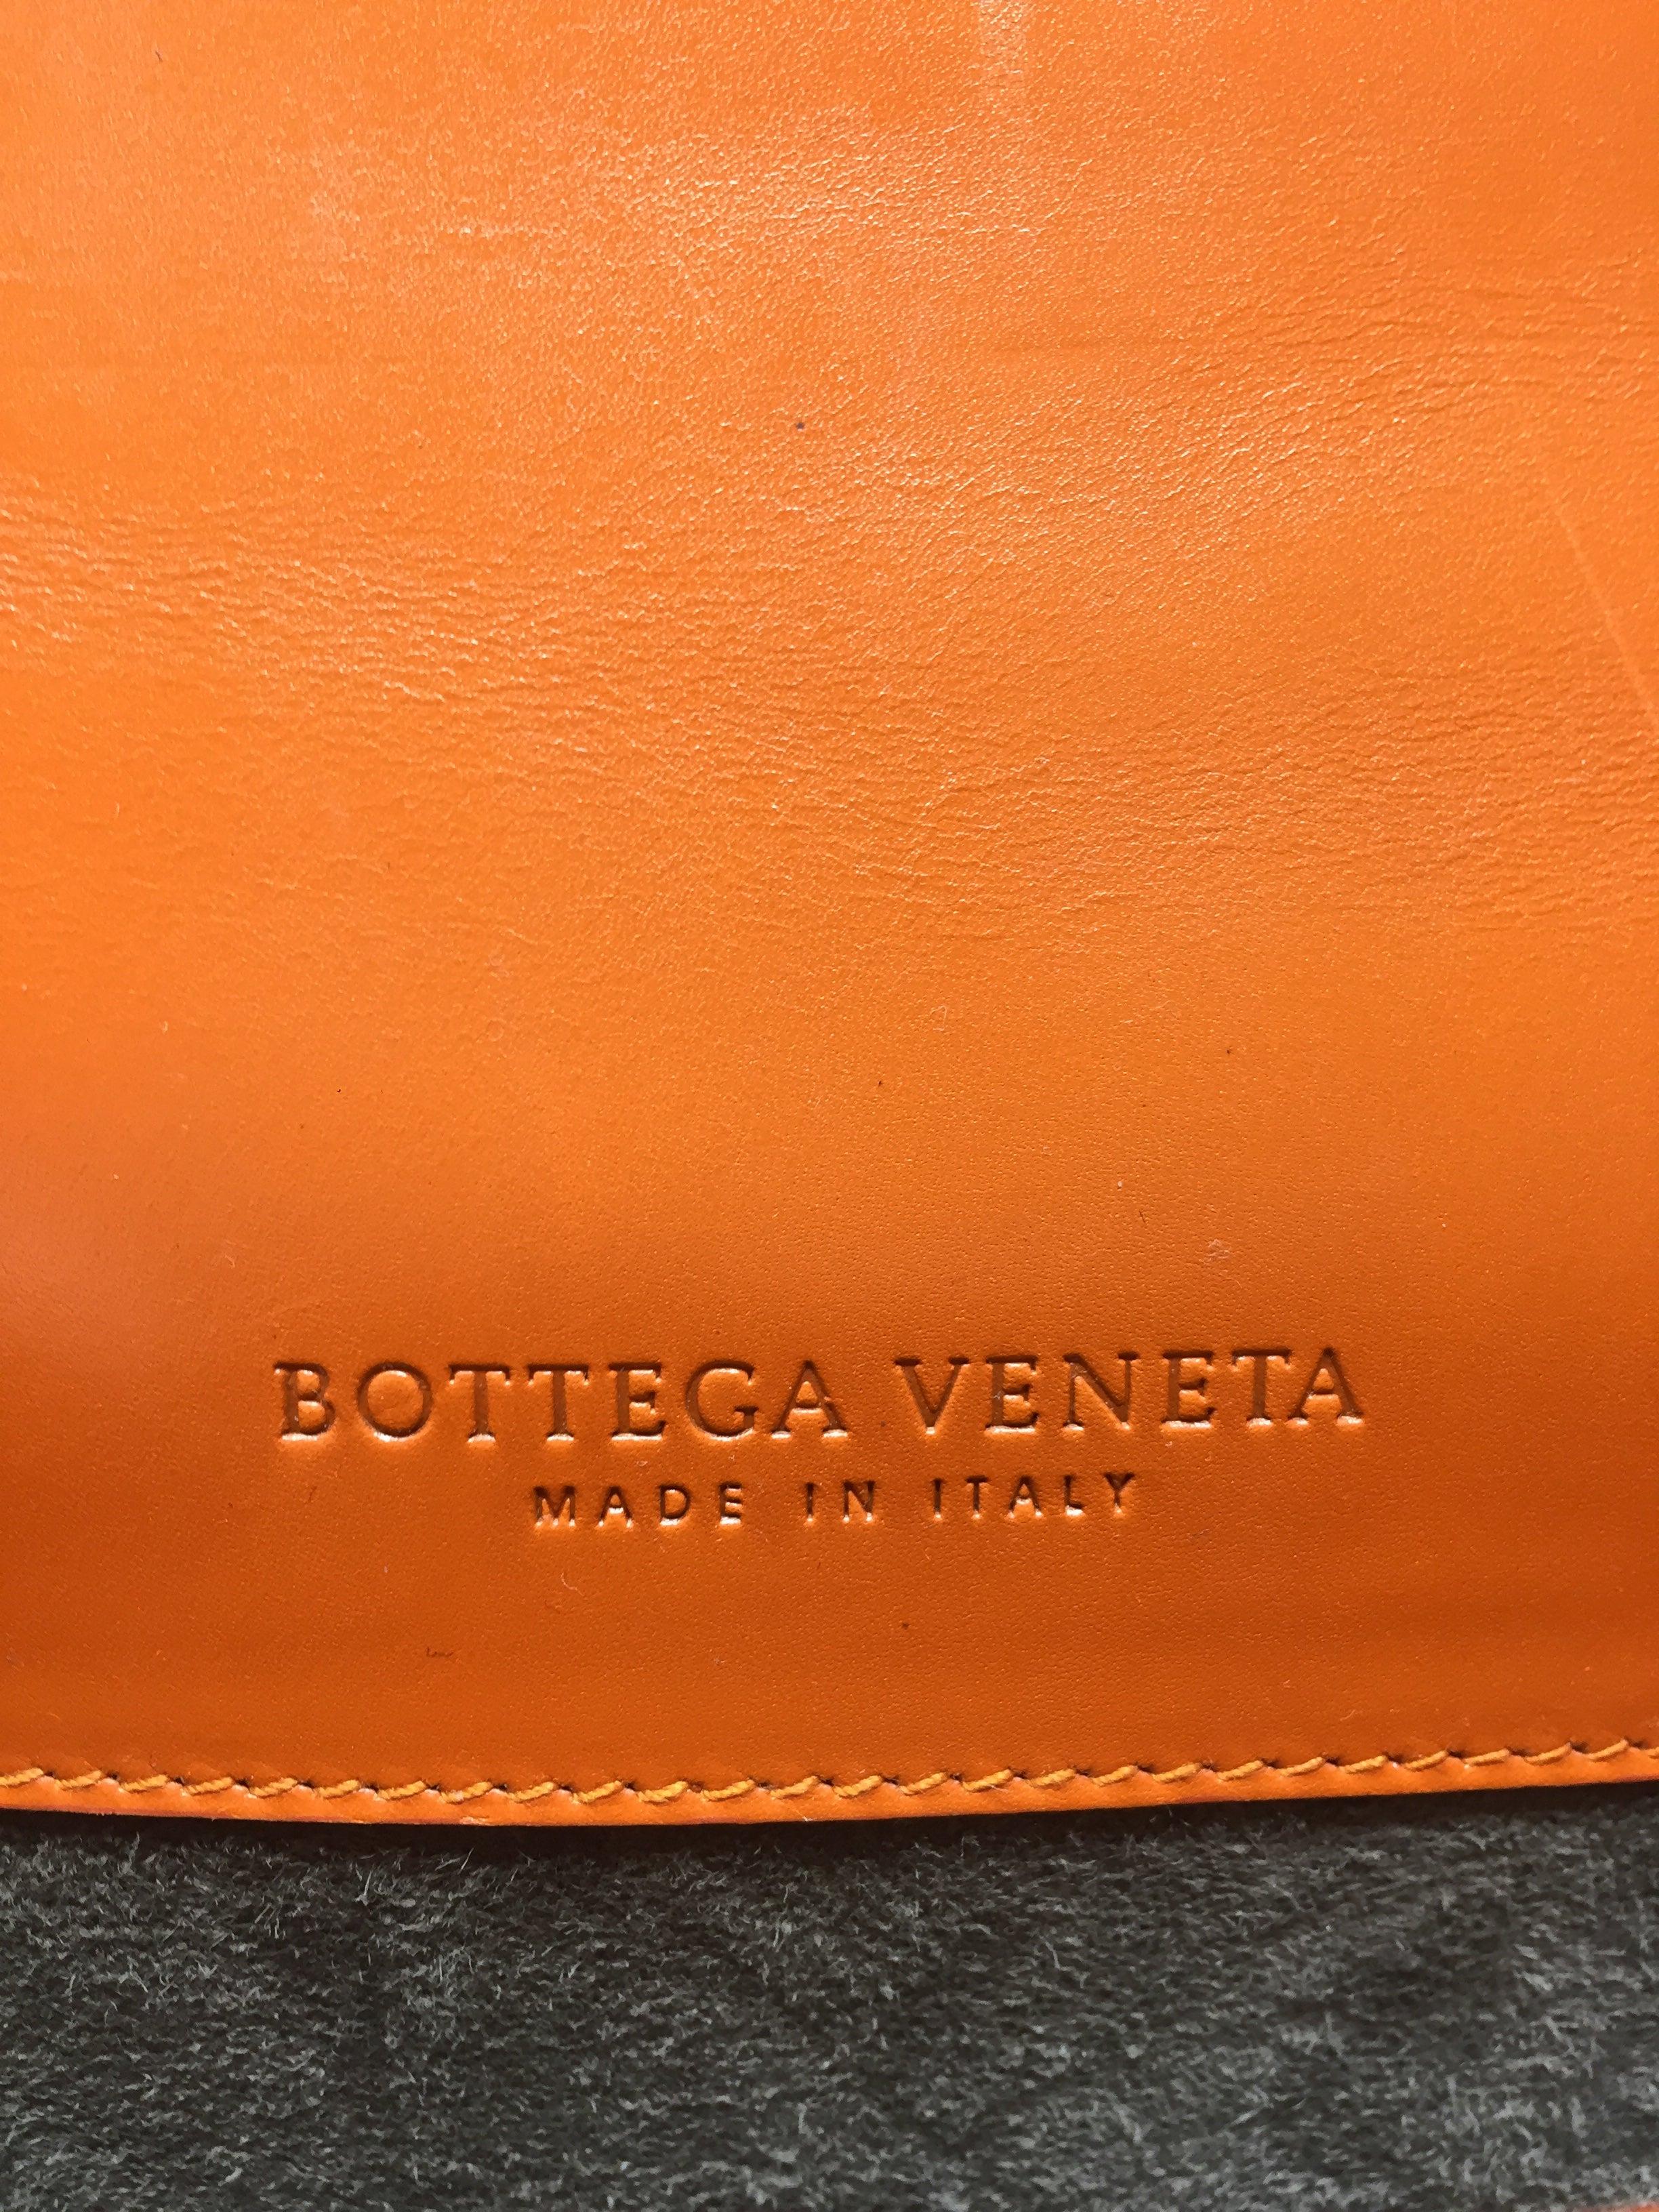 b13dbaa995 Bottega Veneta BV Crocodile Orange Leather Clutch For Sale at 1stdibs